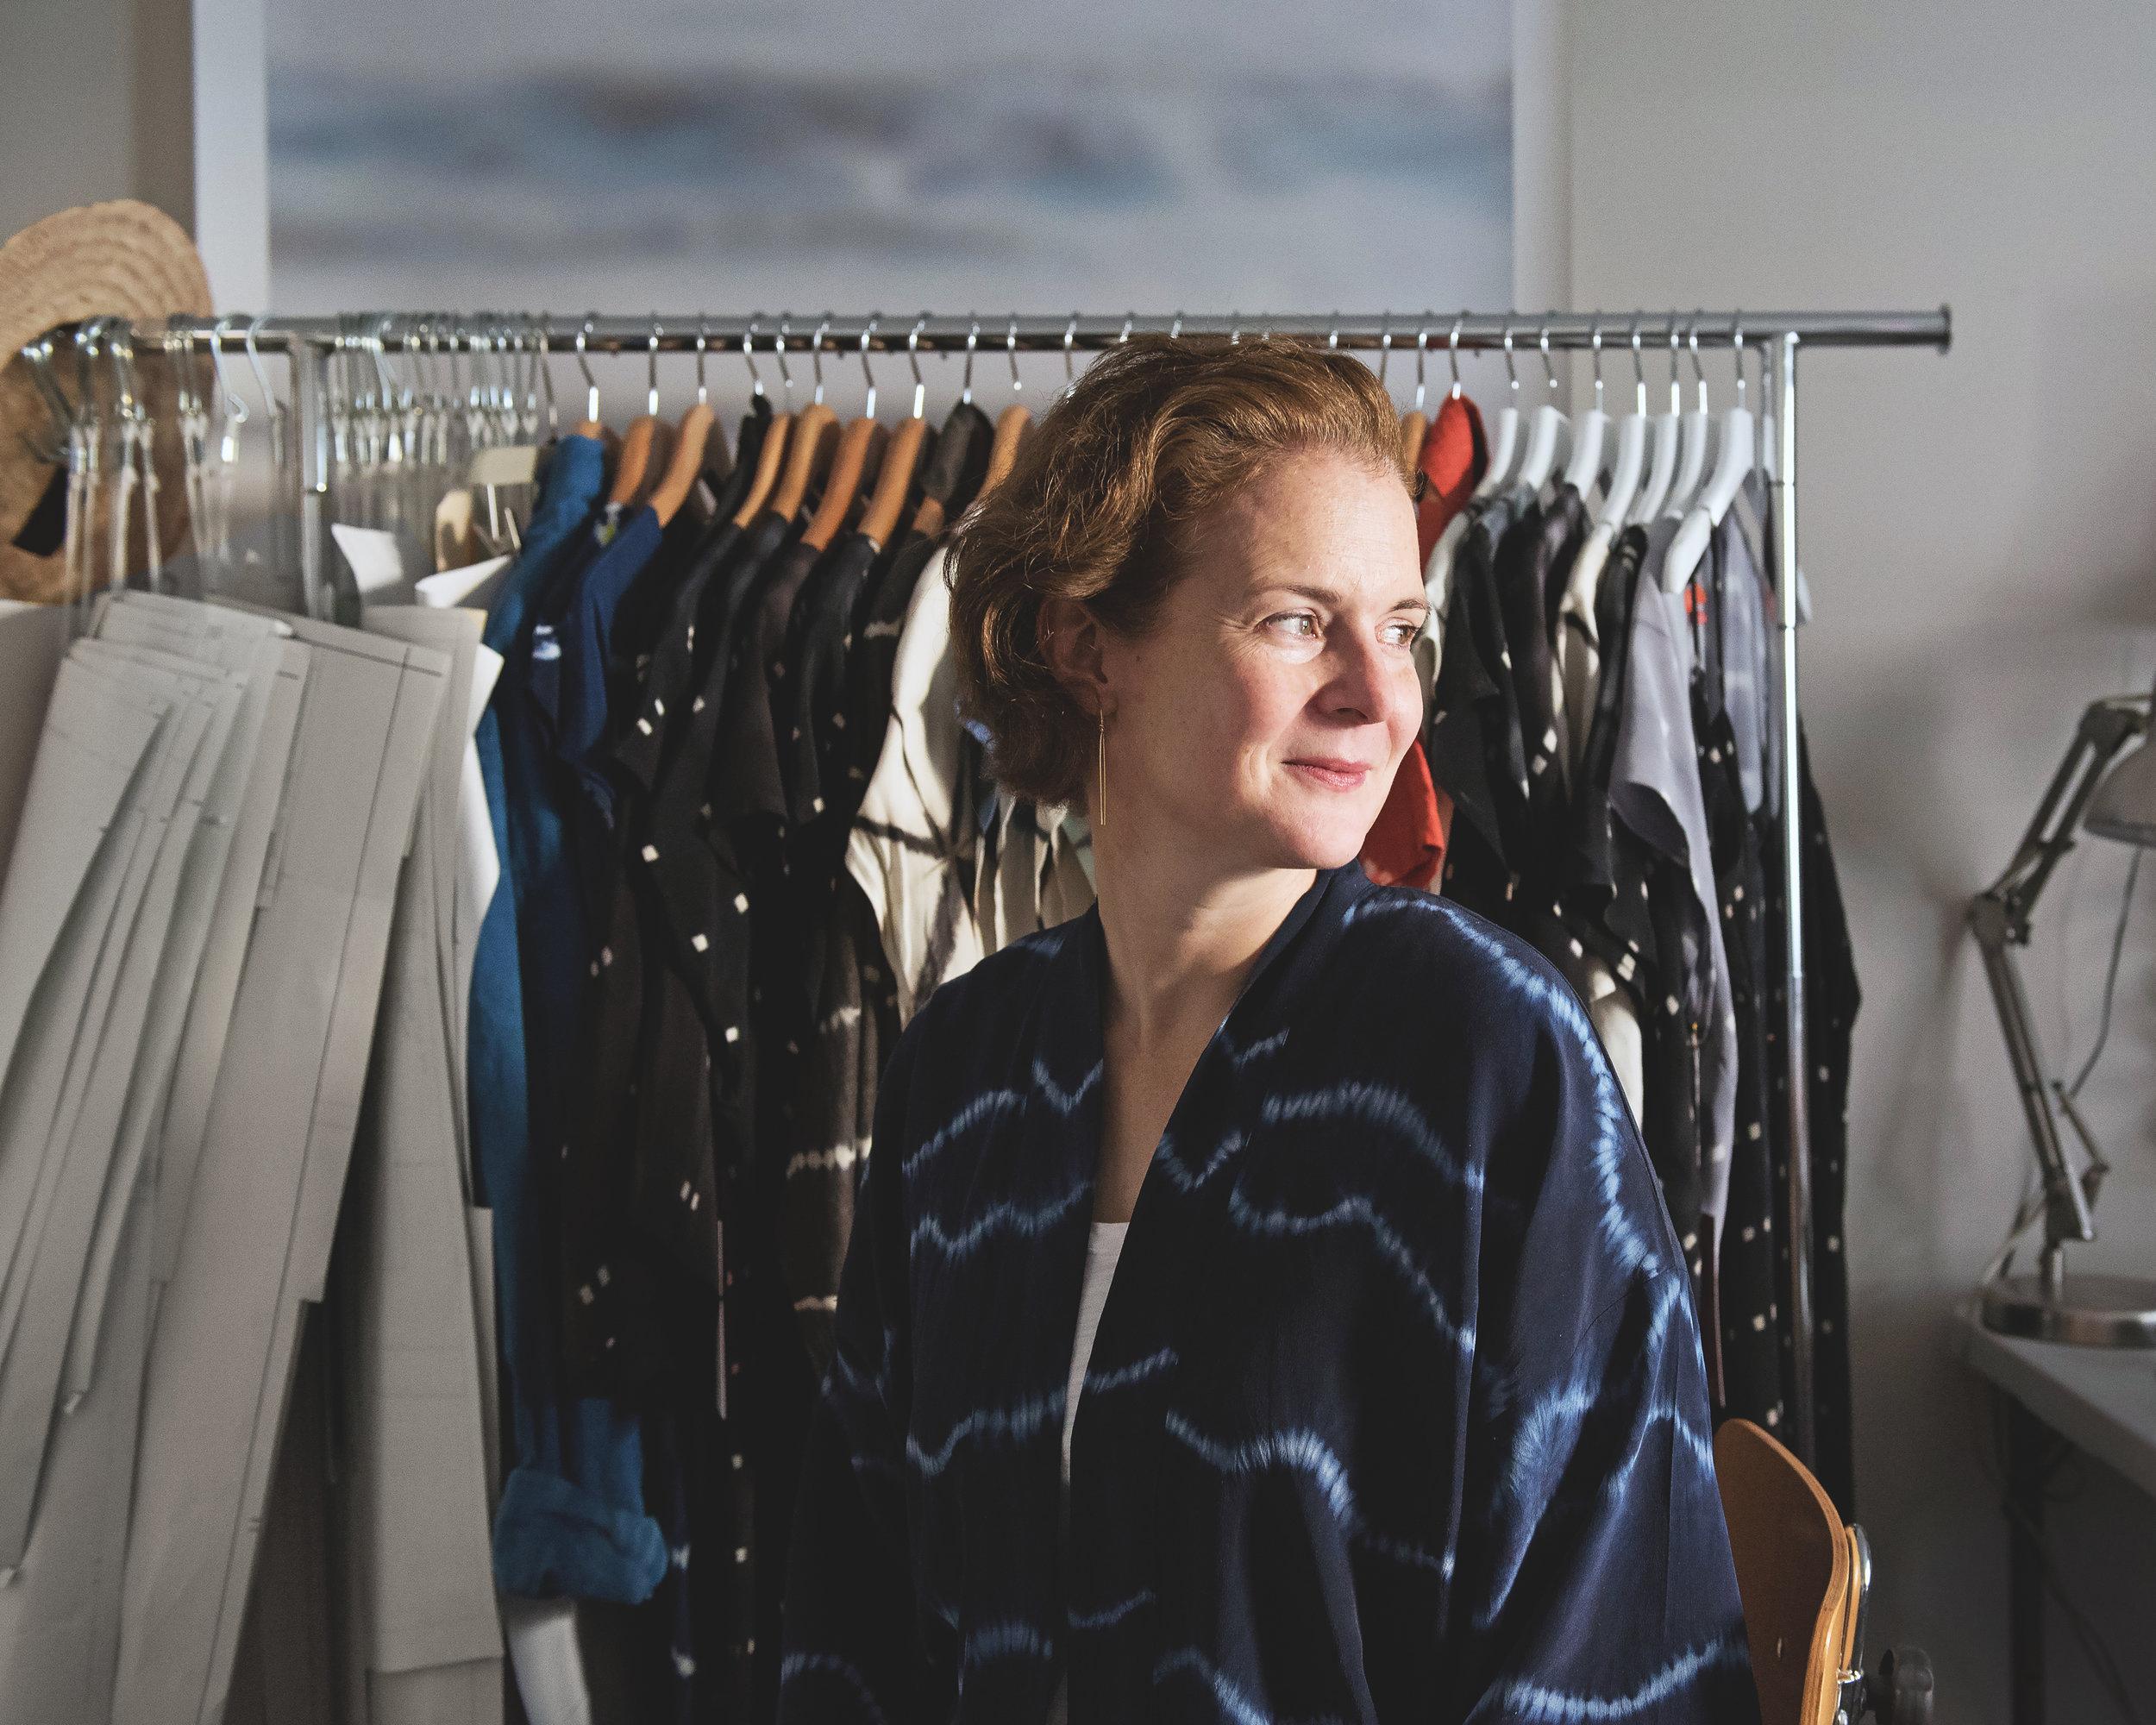 Erin Murphy Doan, the woman behind the brand